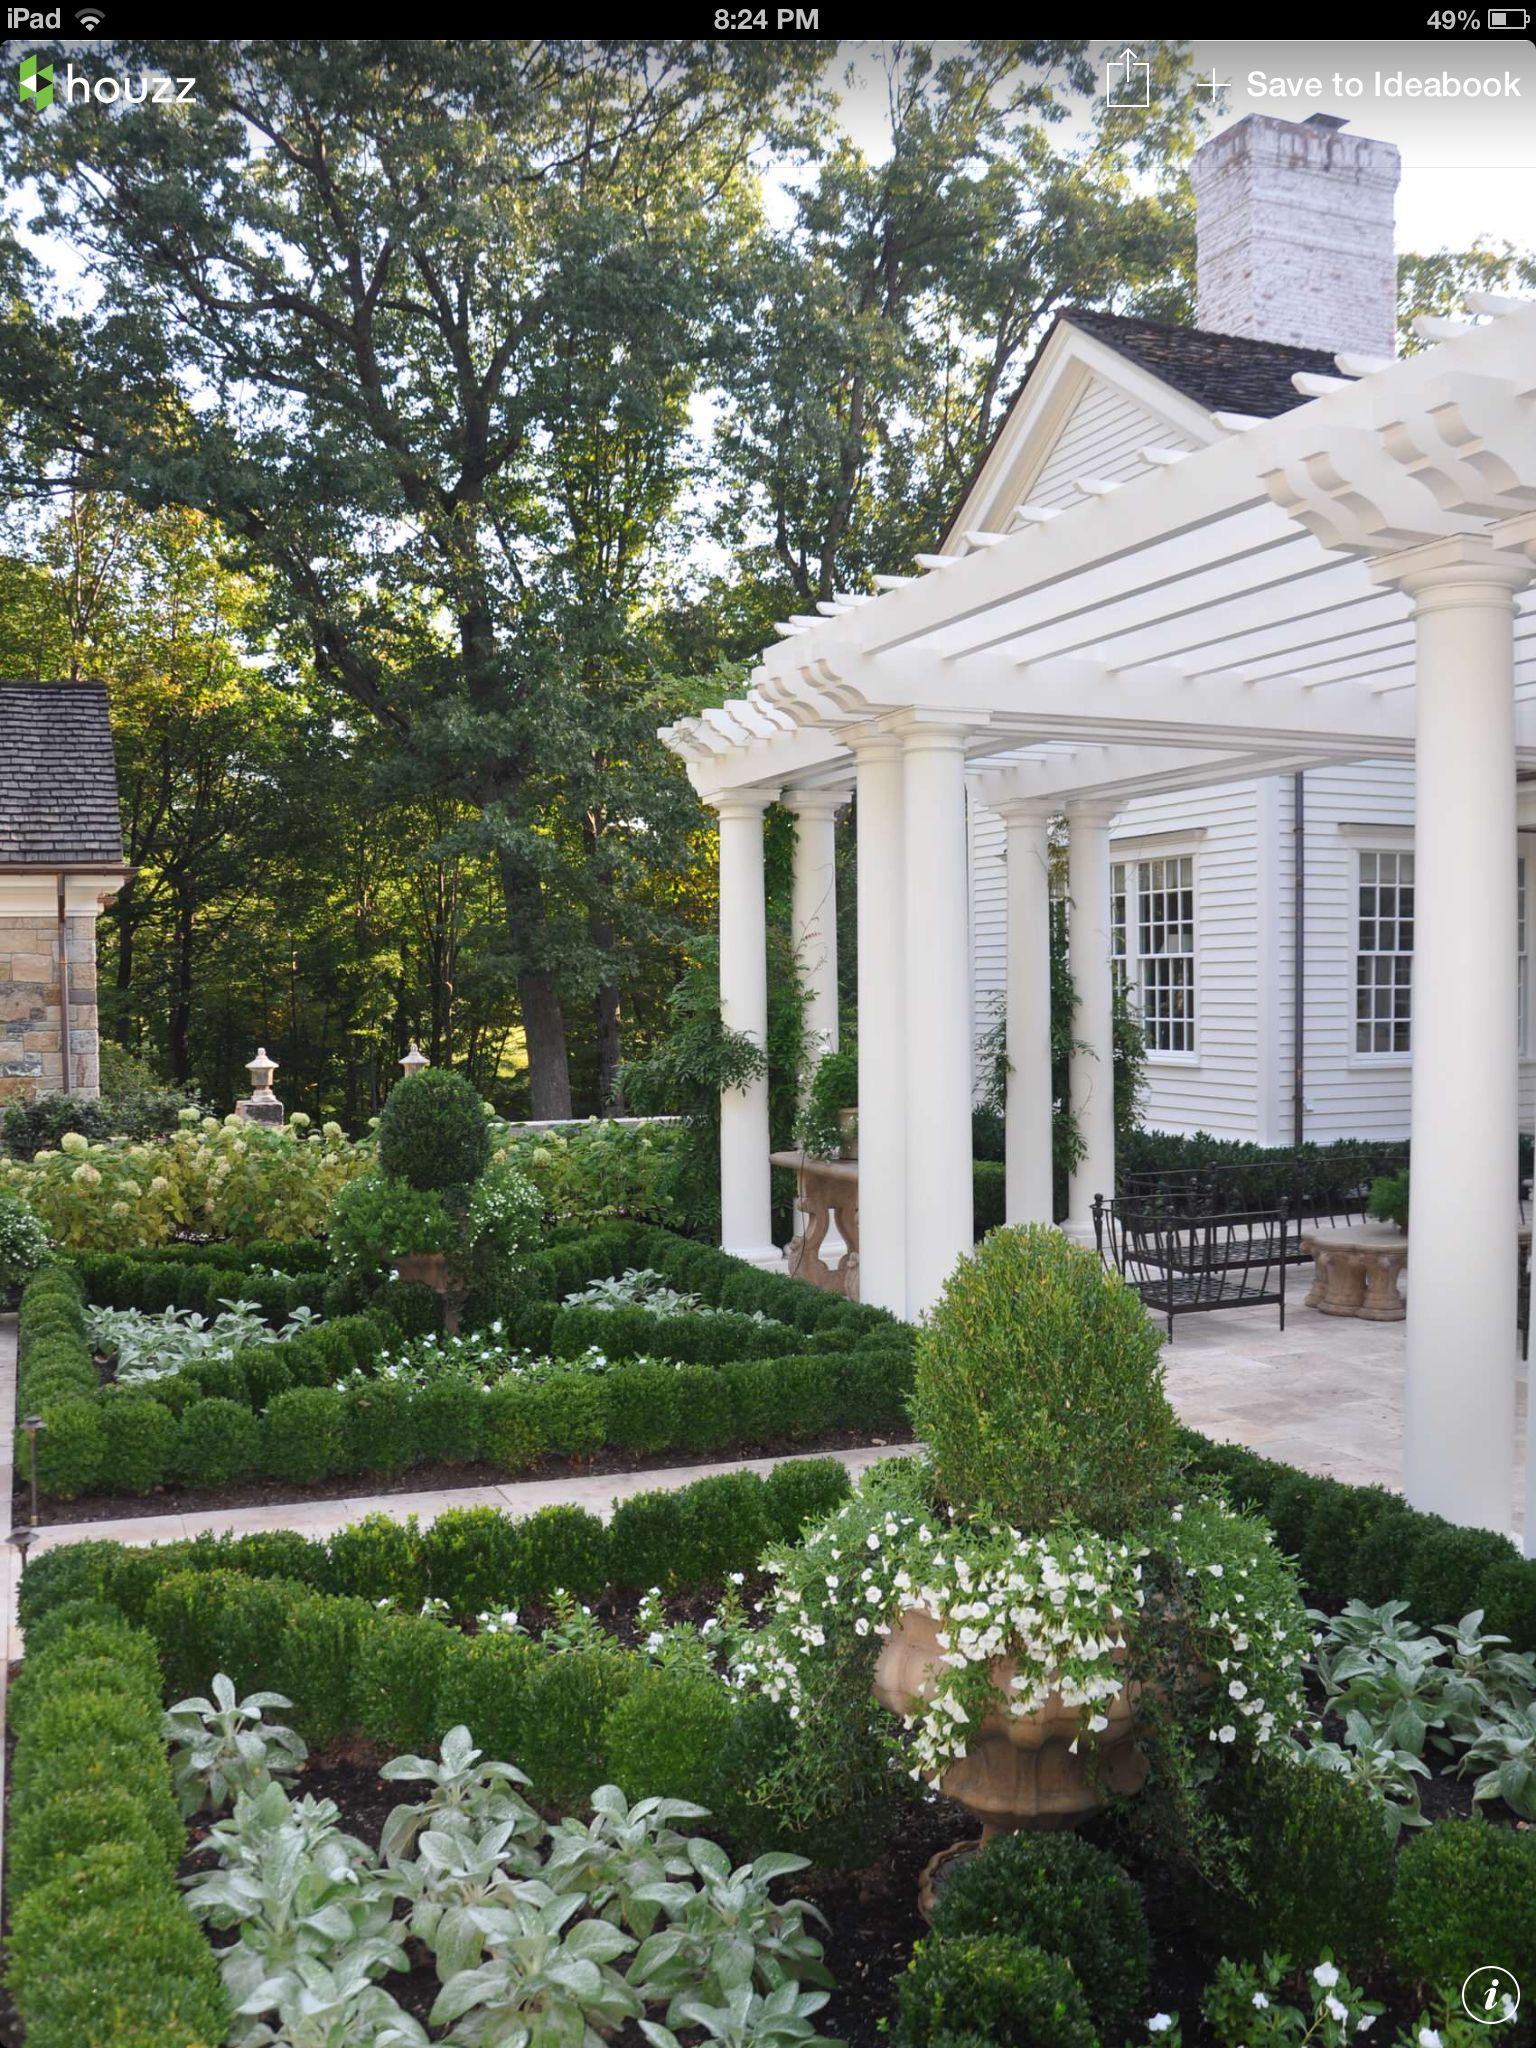 outdoor areas pinterest le jardin et jardins. Black Bedroom Furniture Sets. Home Design Ideas